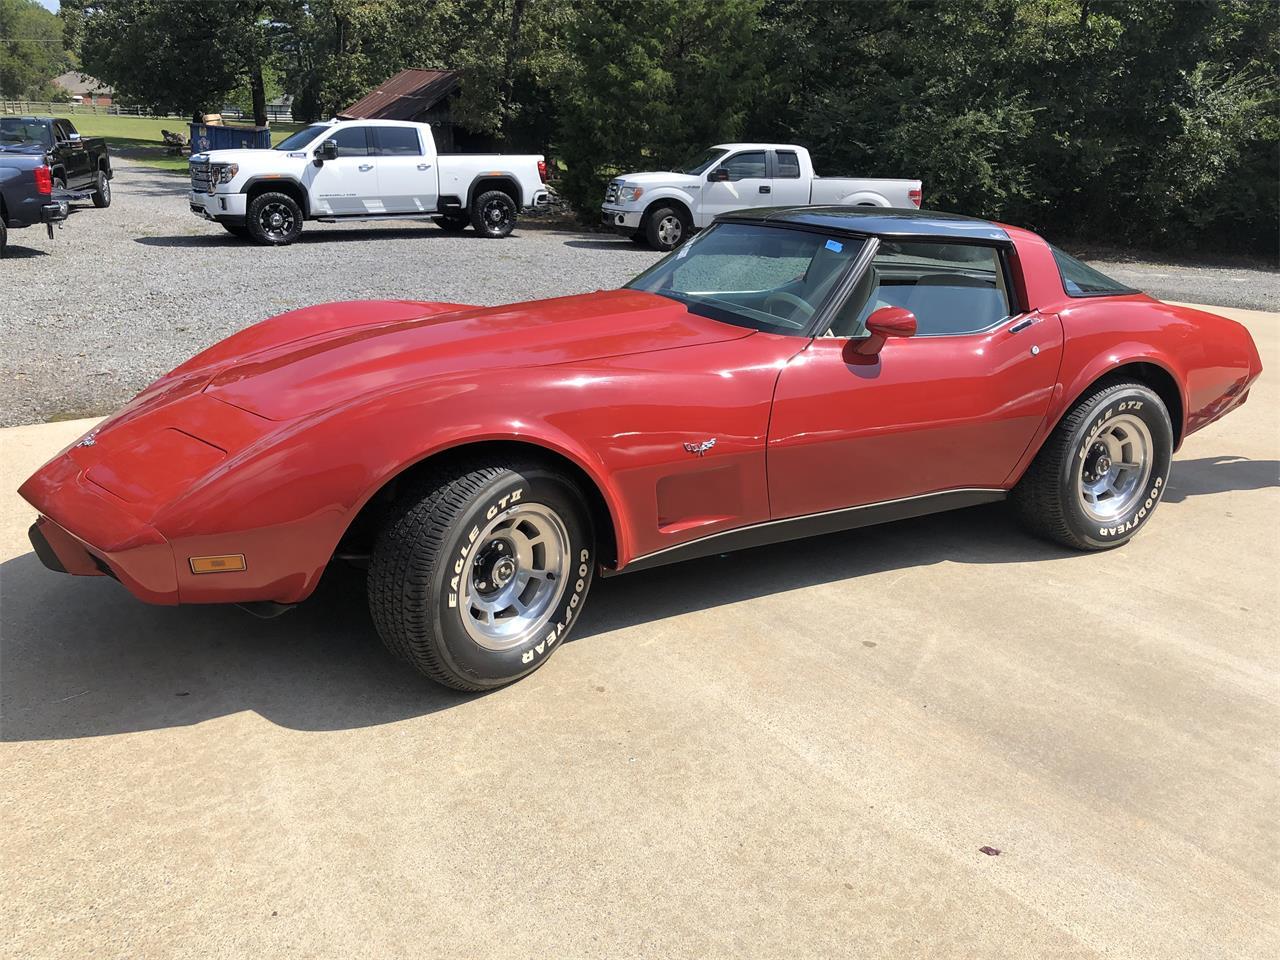 1979 Chevrolet Corvette (CC-1303138) for sale in Scottsdale, Arizona